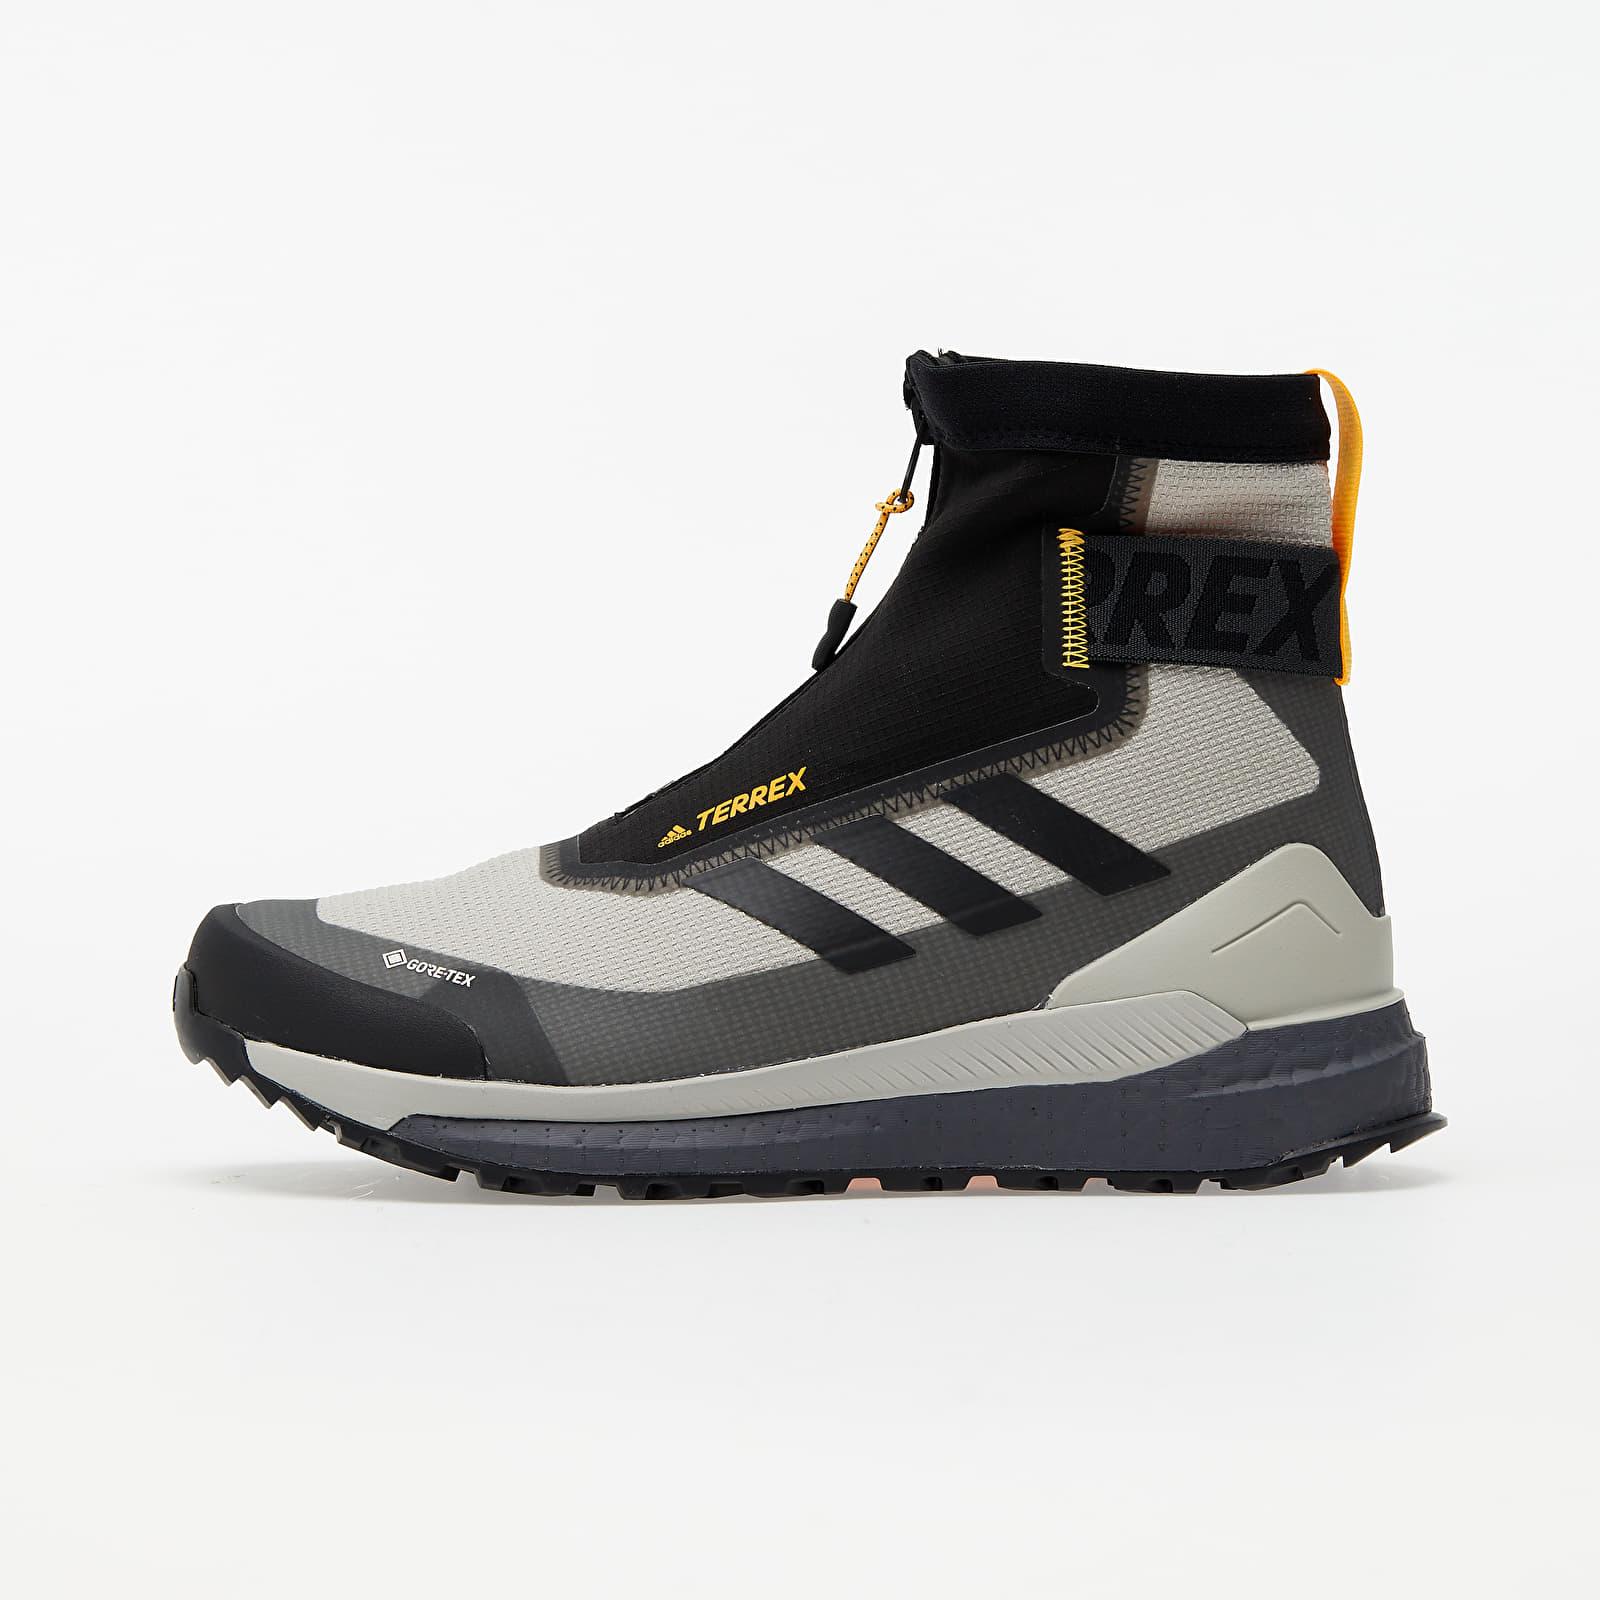 Pánske tenisky a topánky adidas Terrex Free Hiker COLD.RDY Metalic Grey/ Core Black/ Solid Gold